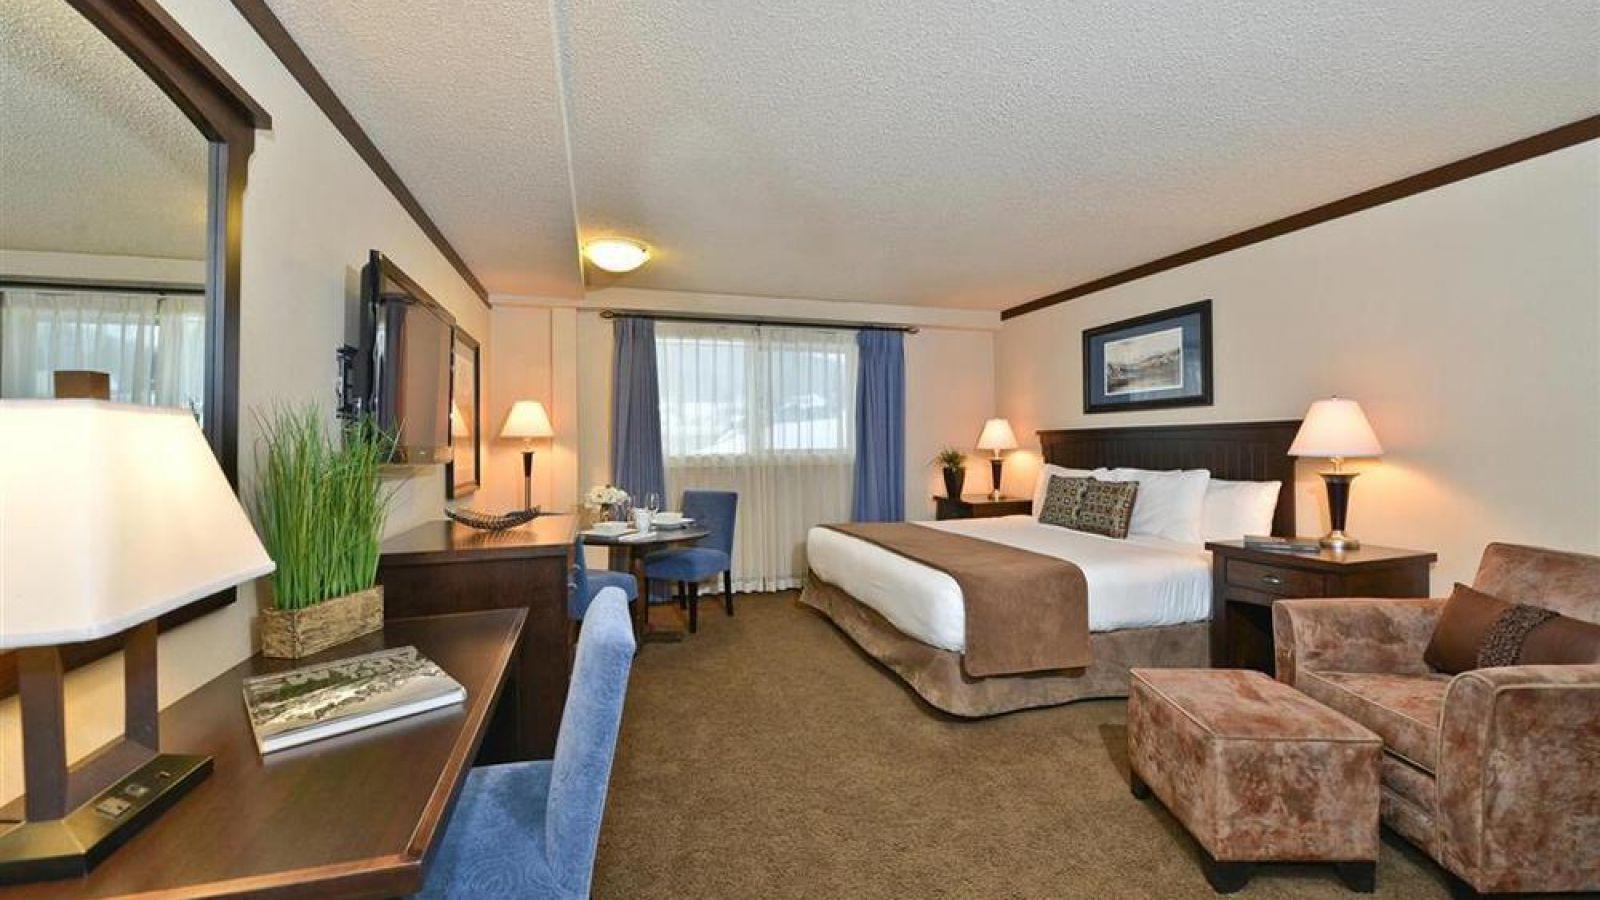 The Prestige Mountain Resort Rossland - East Kootenays golf packages